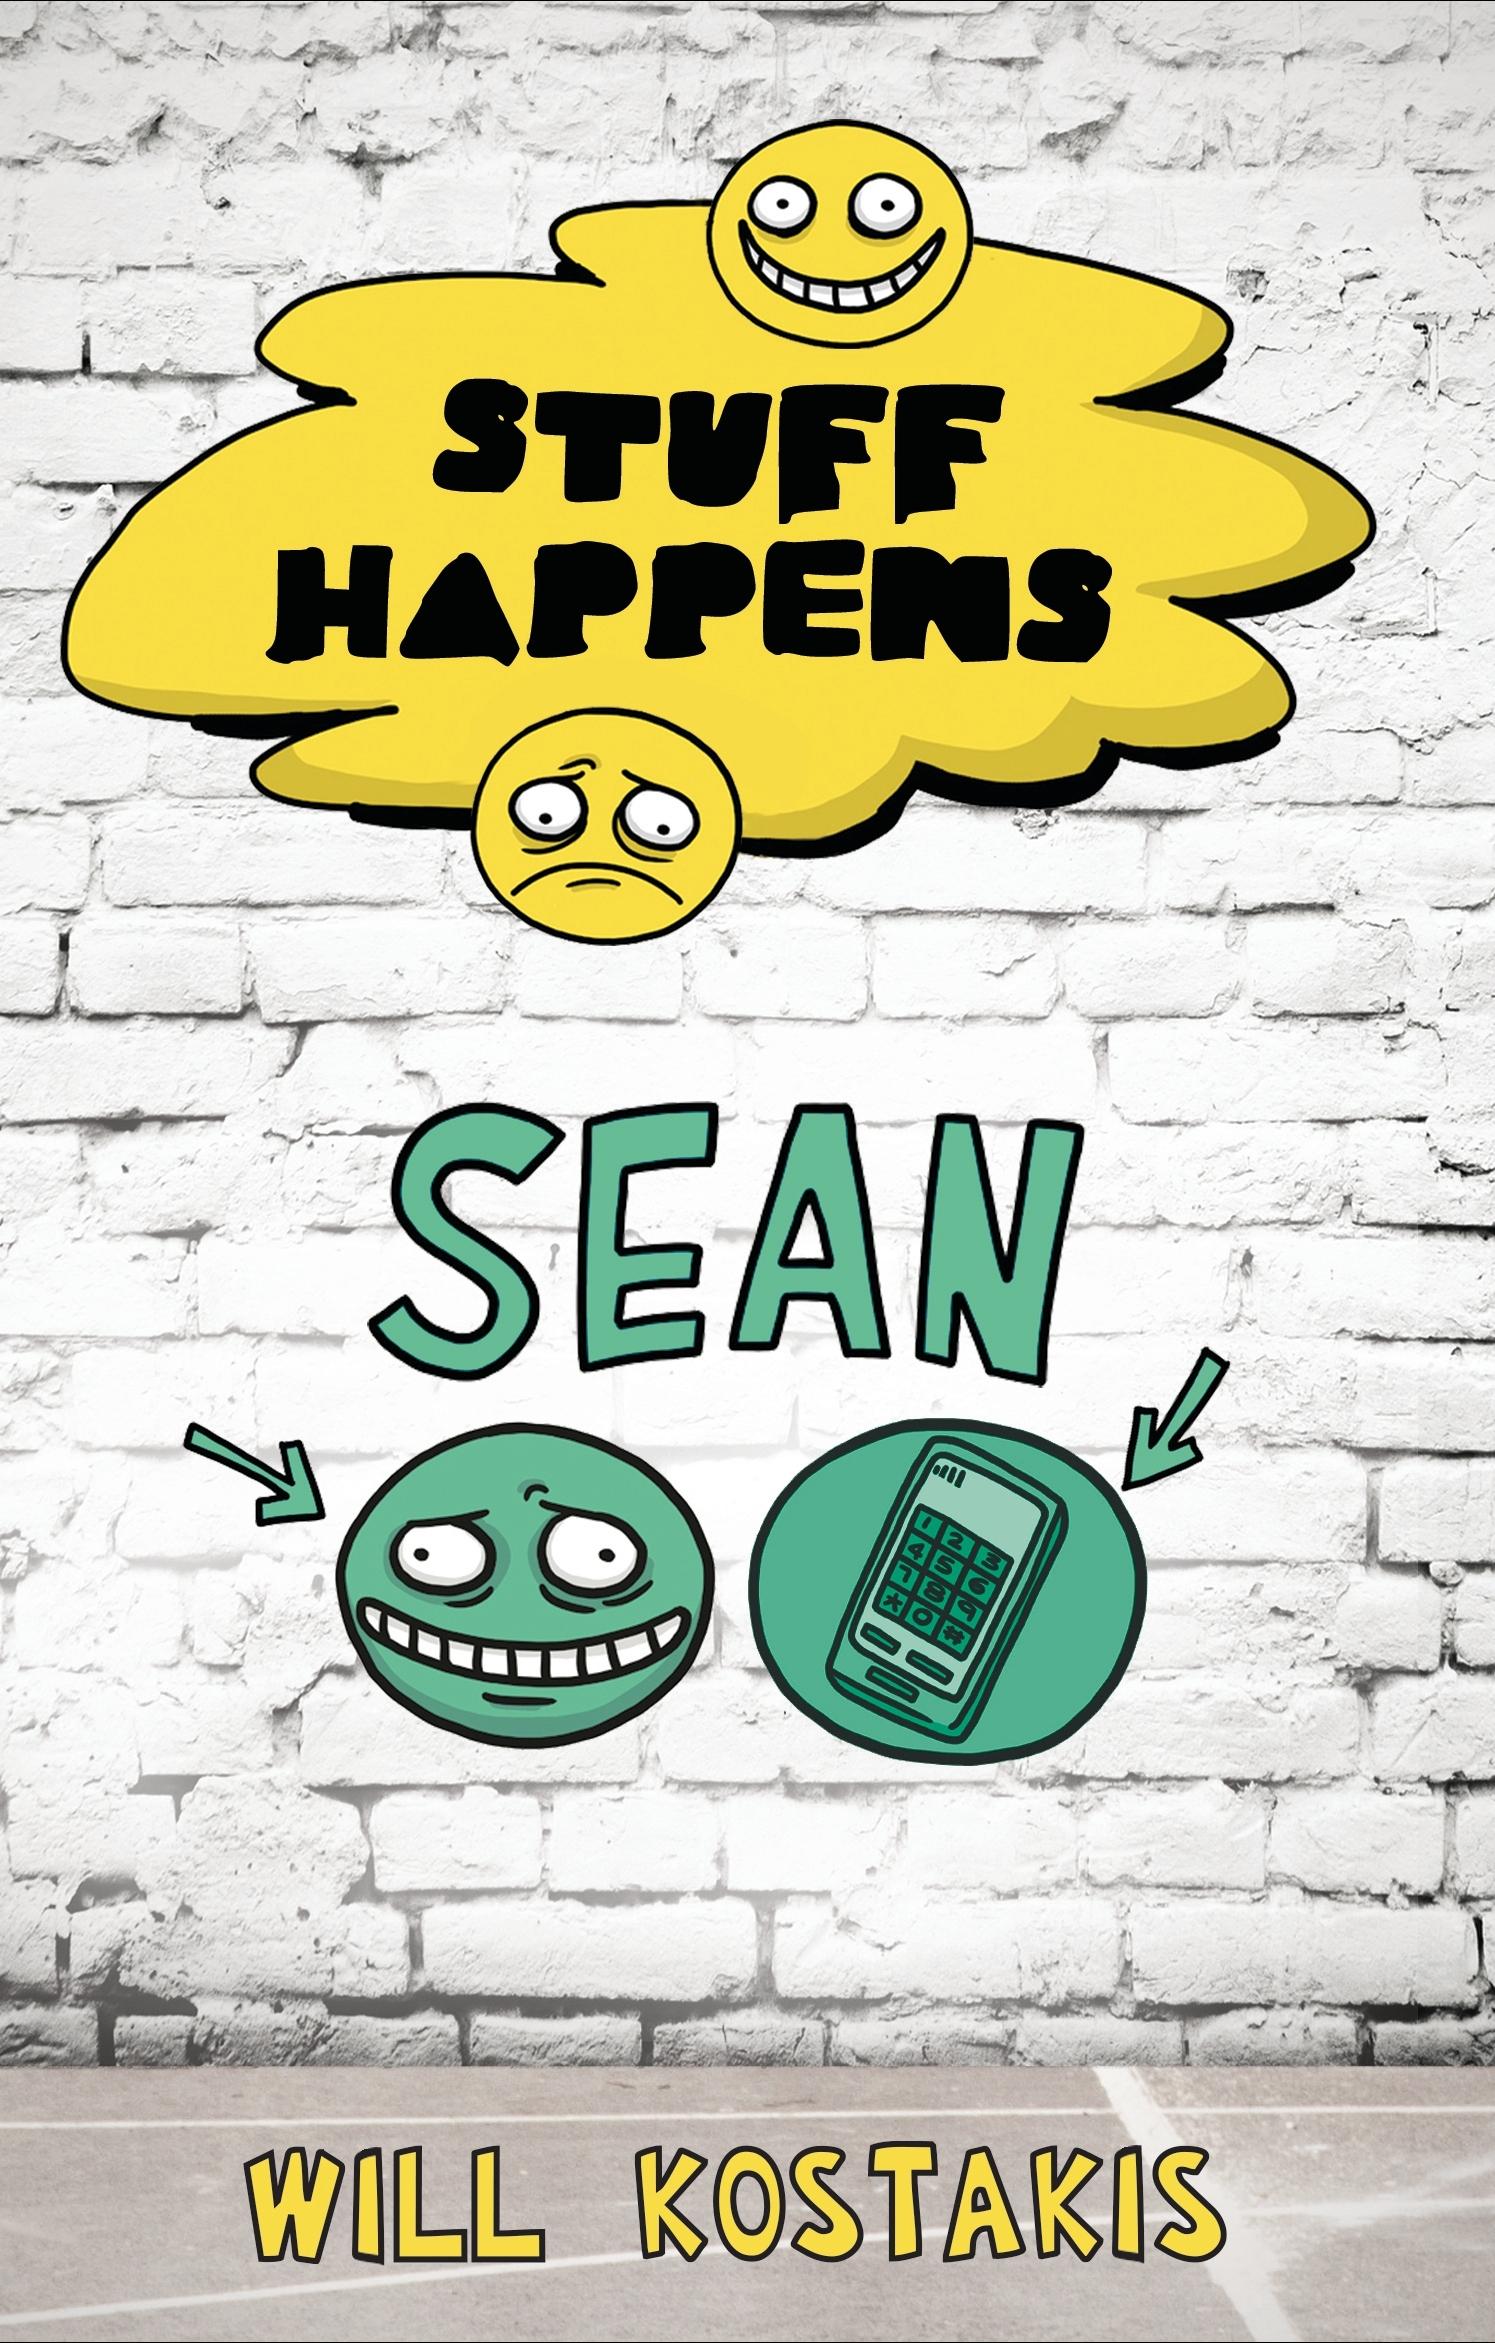 Stuff Happens: Sean by Will Kostakis - Penguin Books Australia